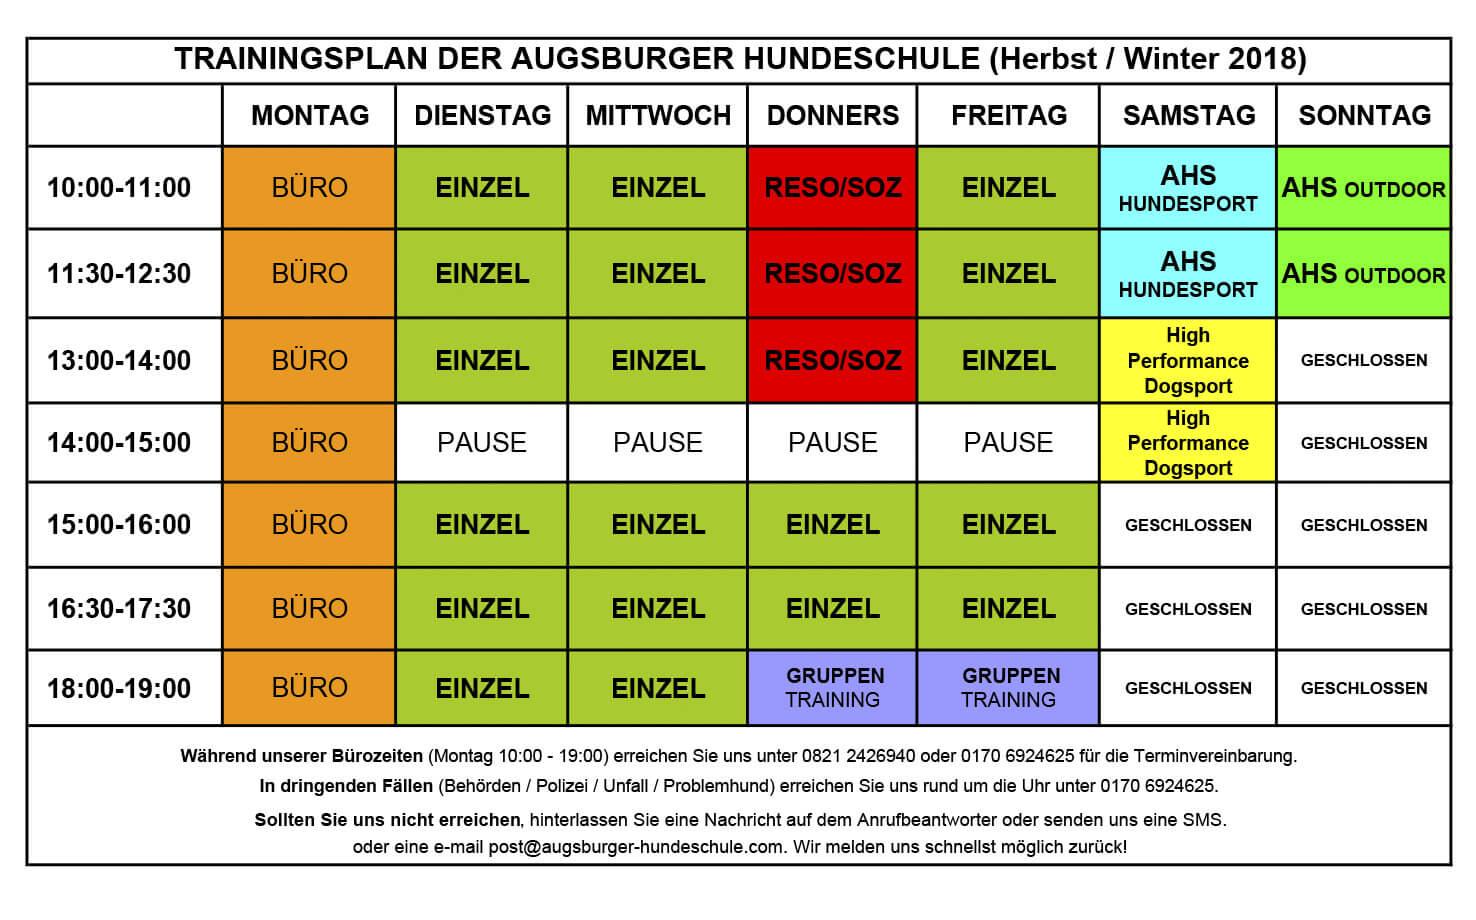 Training Wochenplan Augsburger Hundeschule